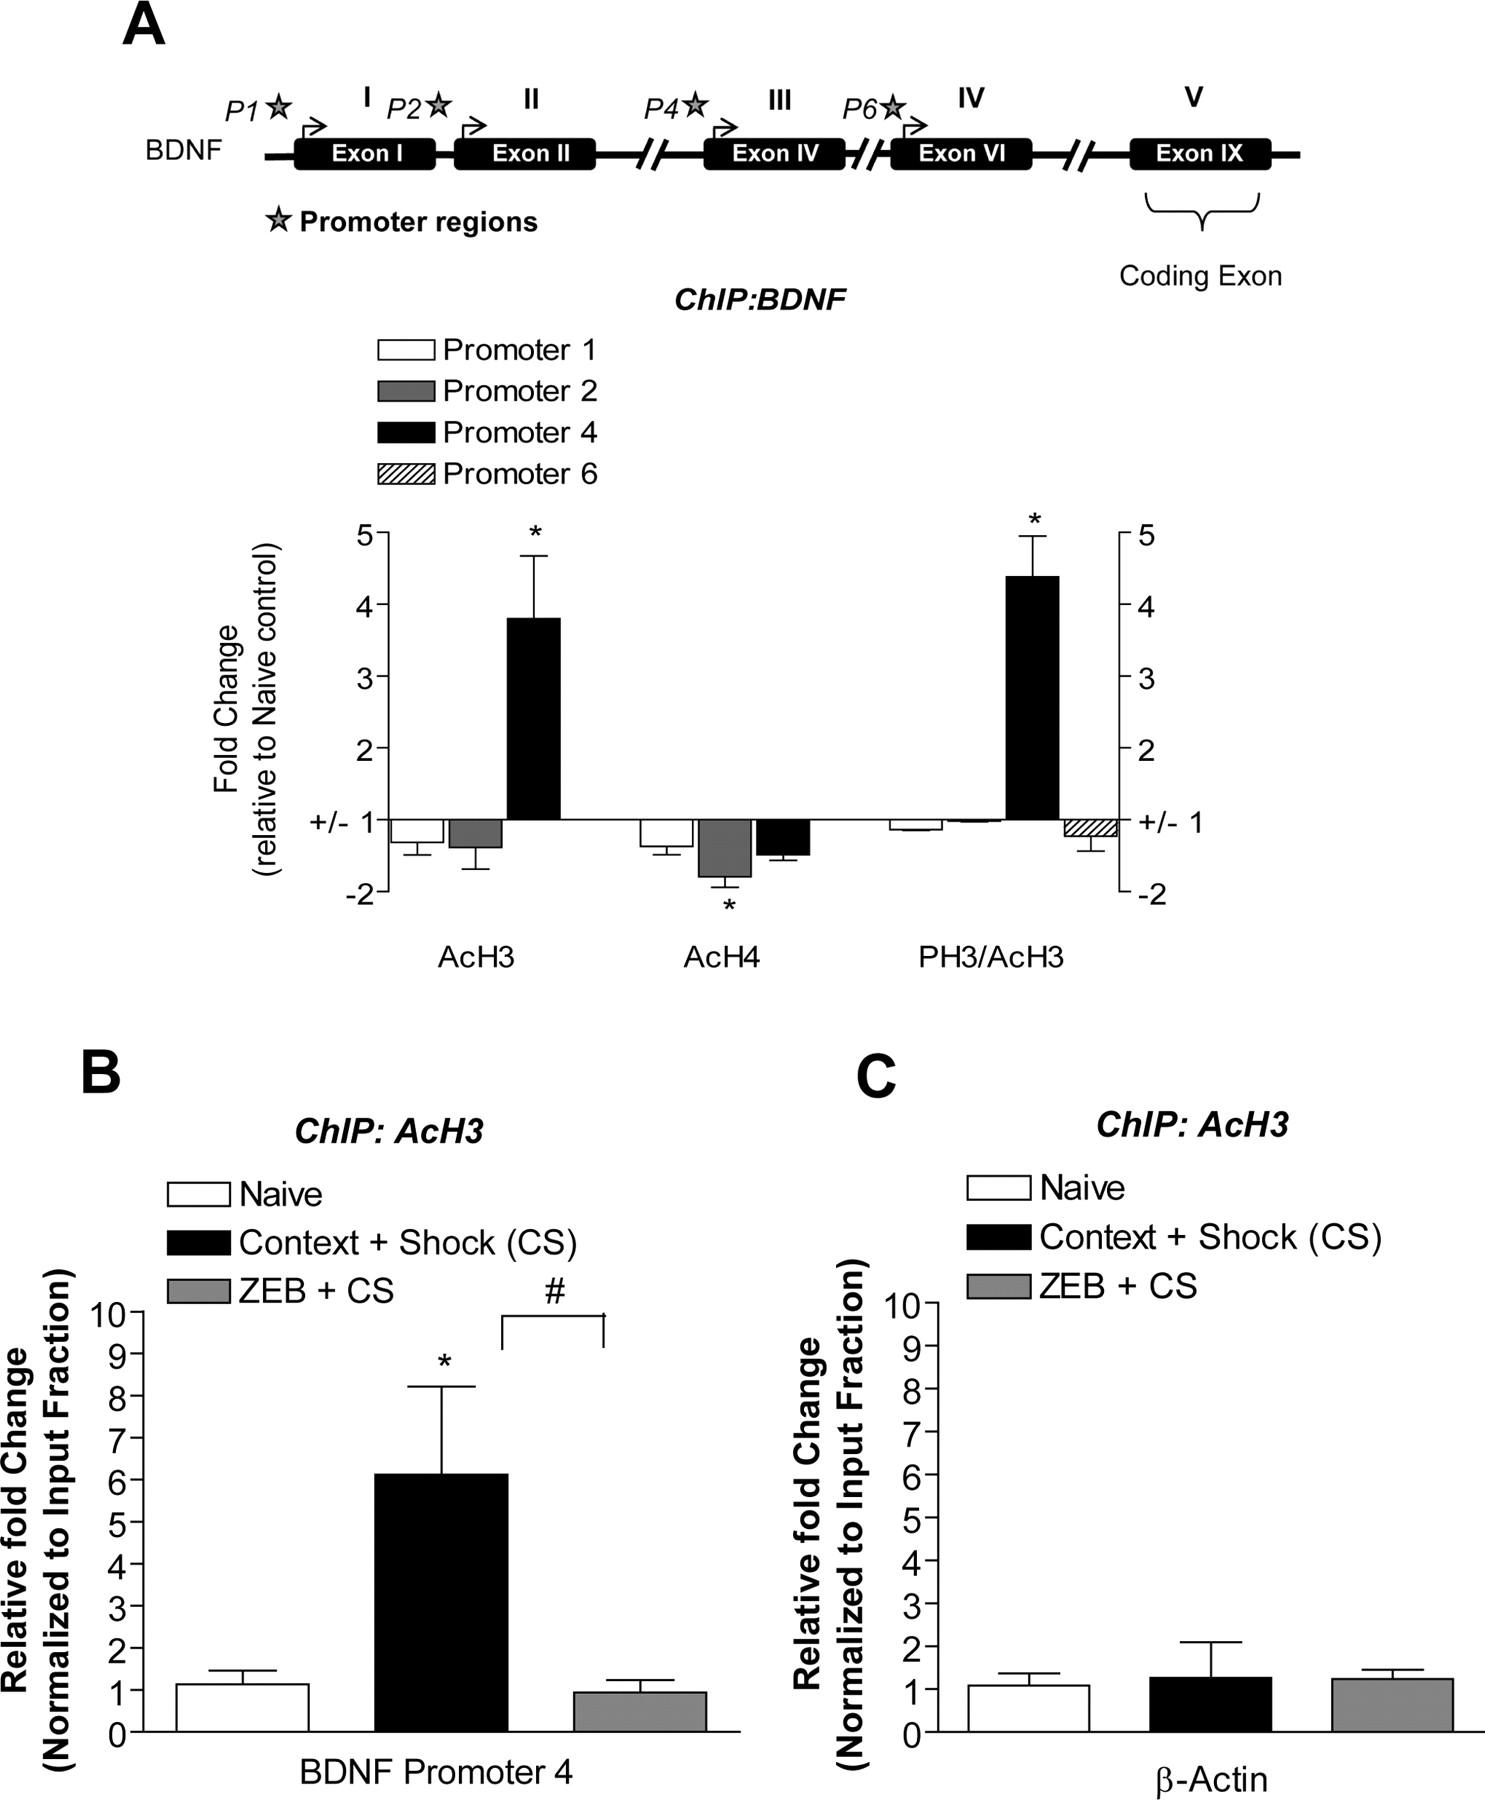 Epigenetic Regulation Of Bdnf Gene Transcription In The